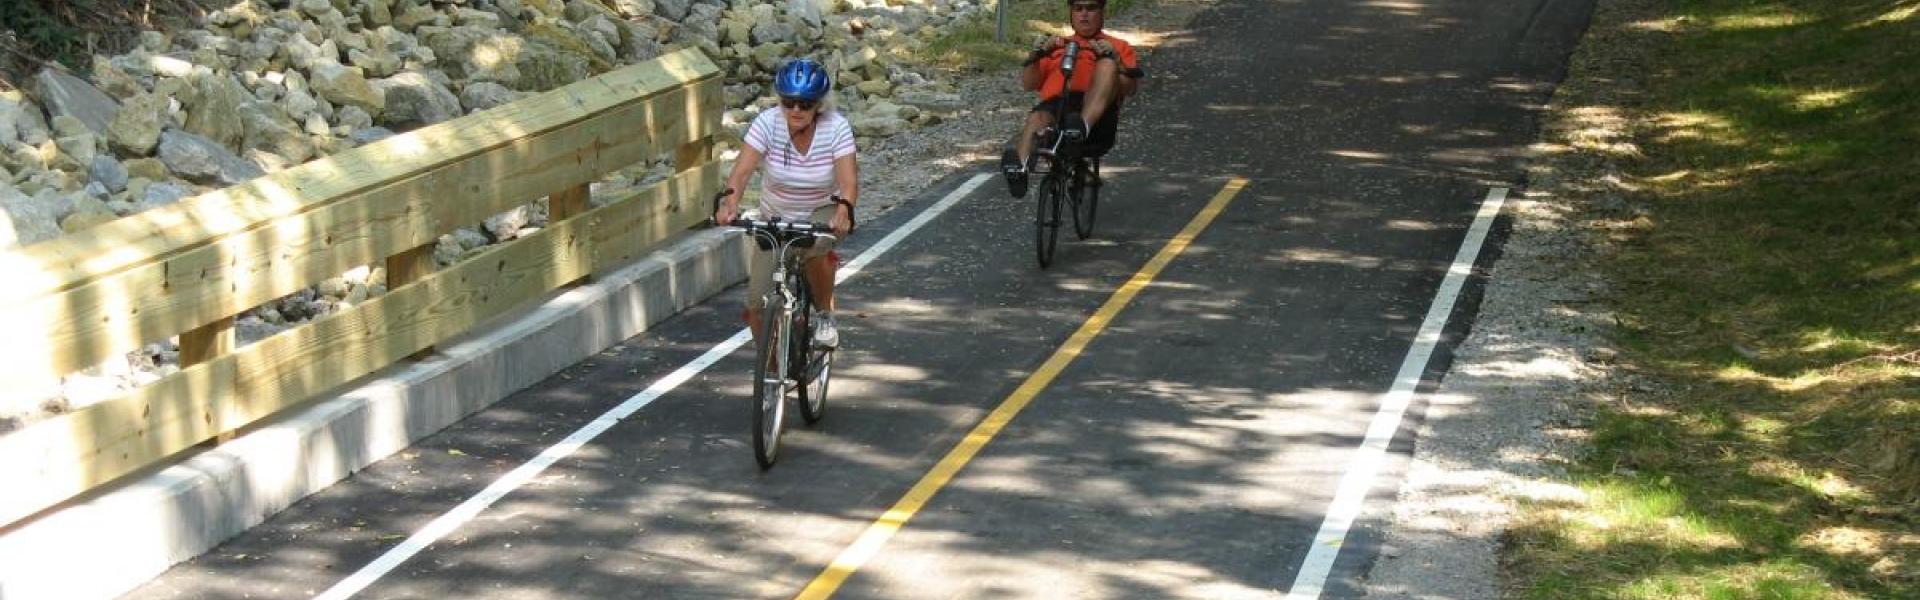 dayton-kettering connector | miami valley bike trails